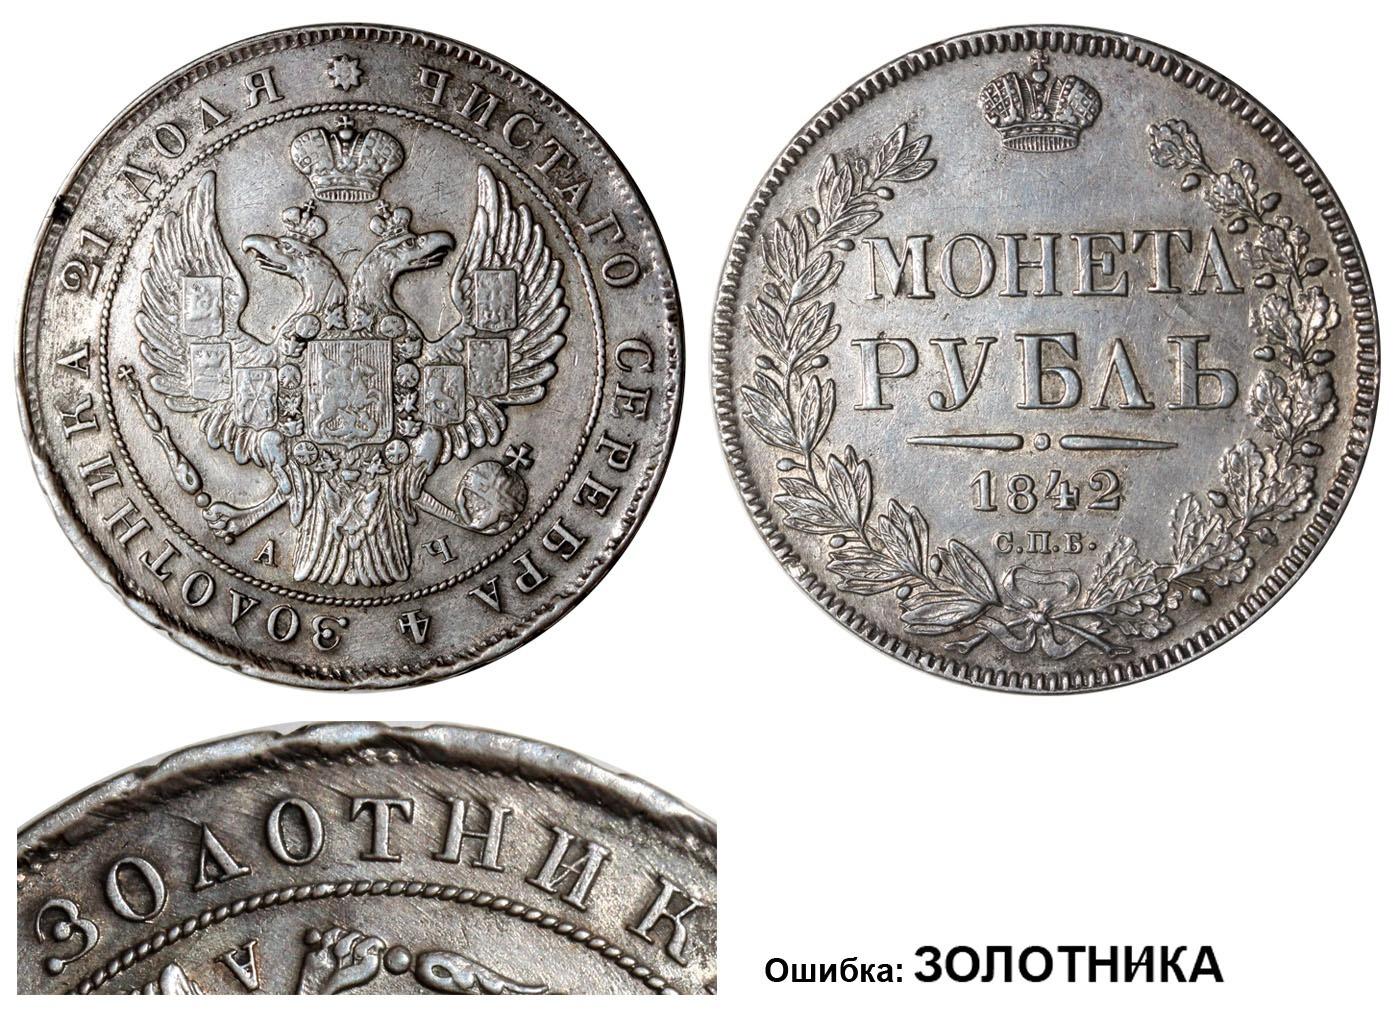 Рубль 1842 СПБ-АЧ IIб-Е ЗОЛОТННКА.jpg